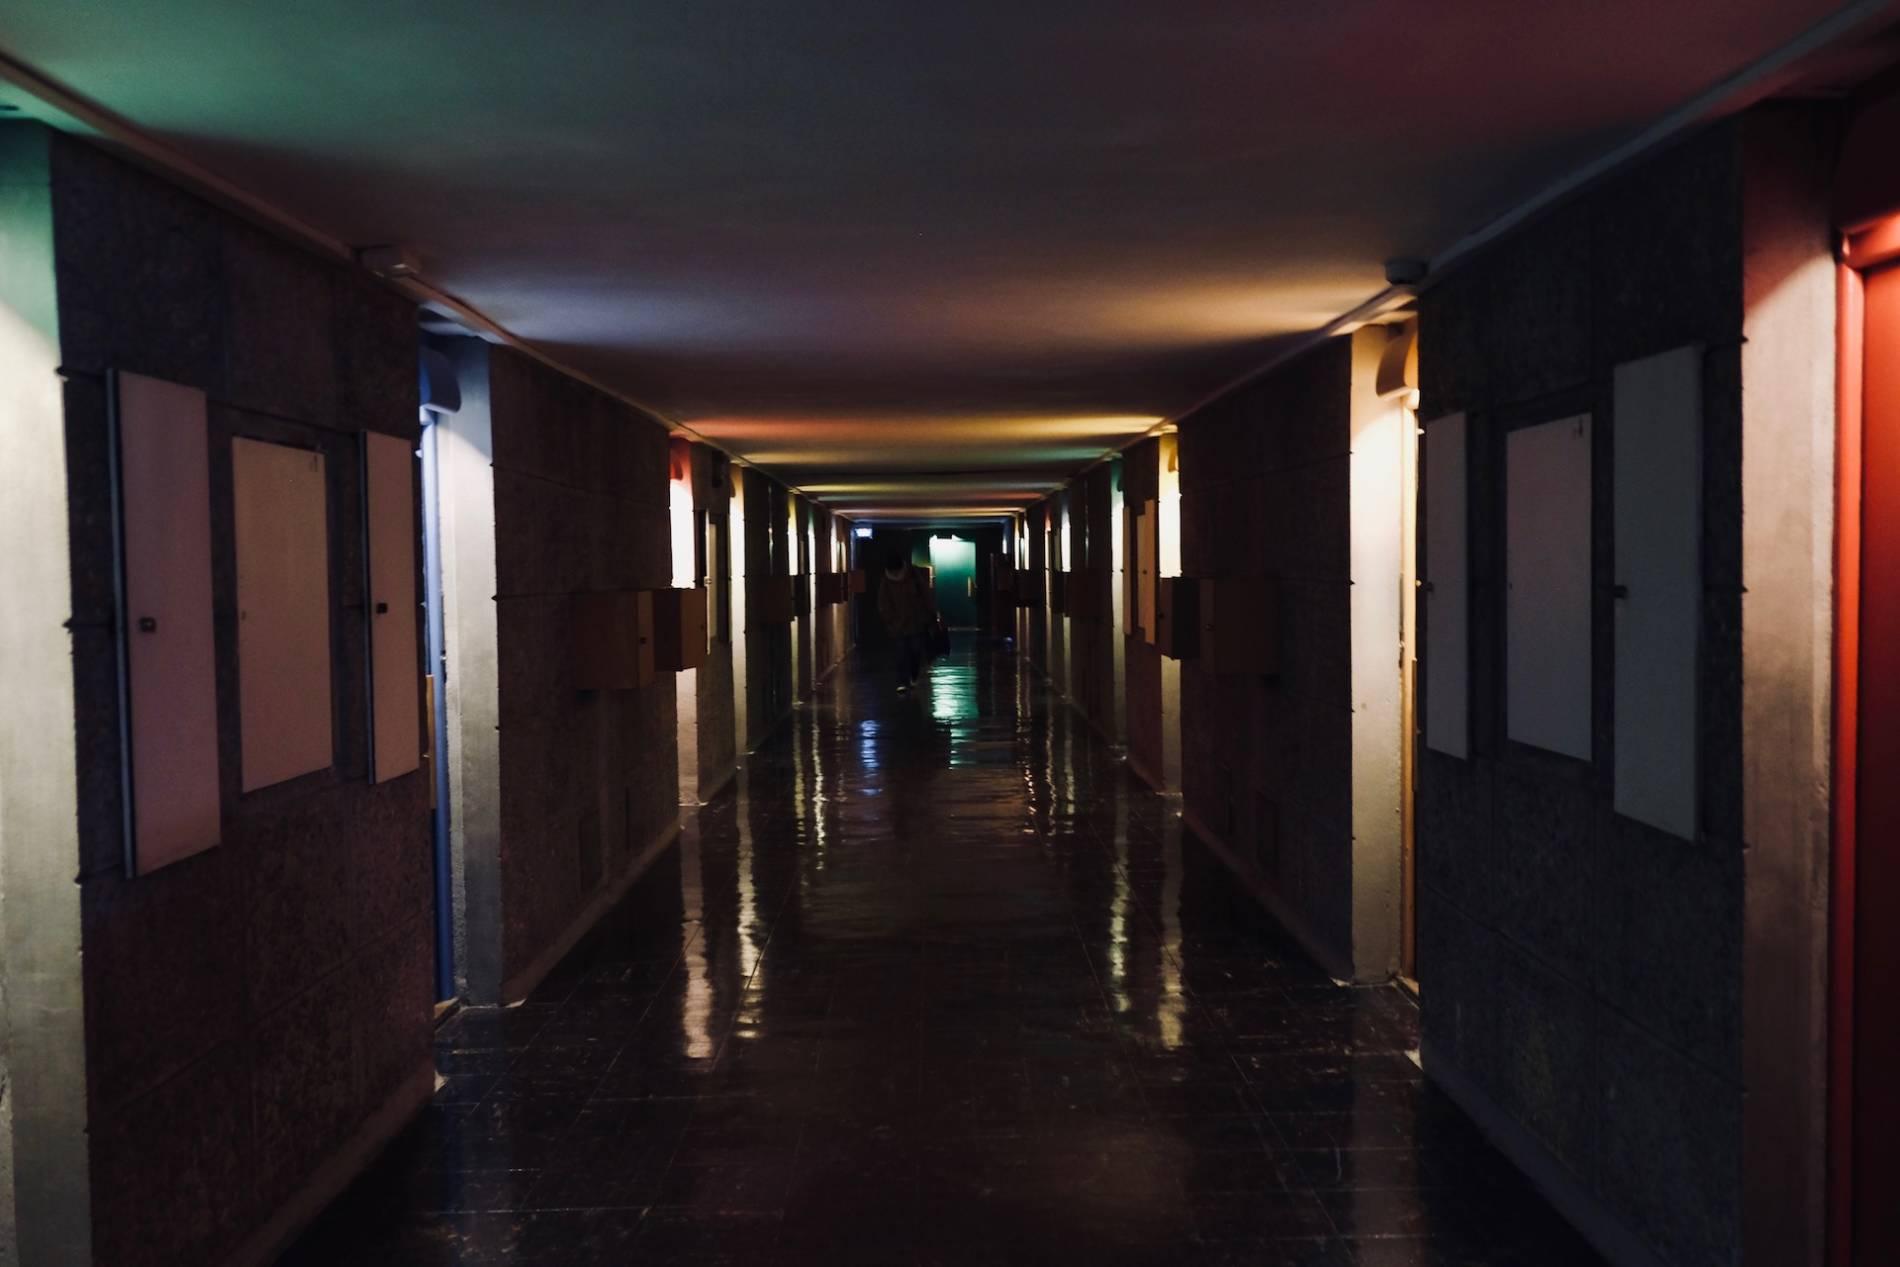 cite-radieuse-le-corbusier-etage